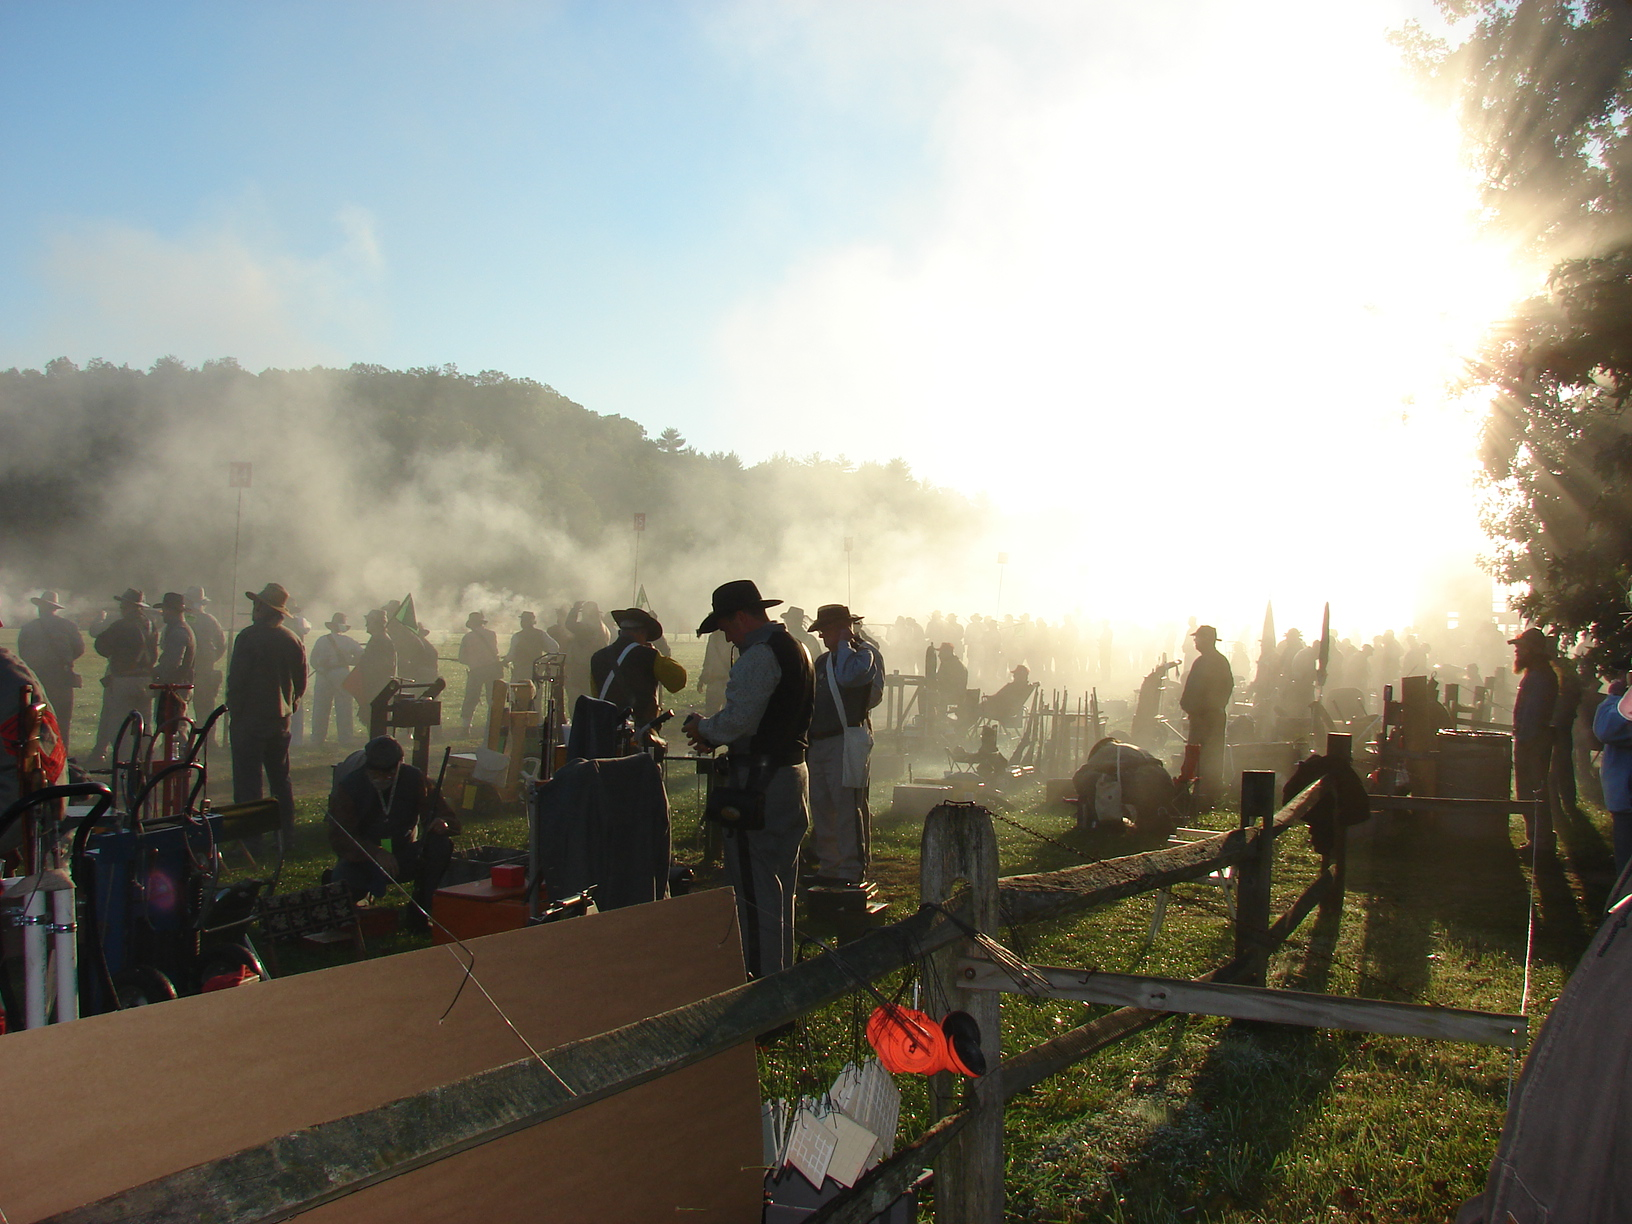 The sight of an early morning skirmish at Fort Shenandoah